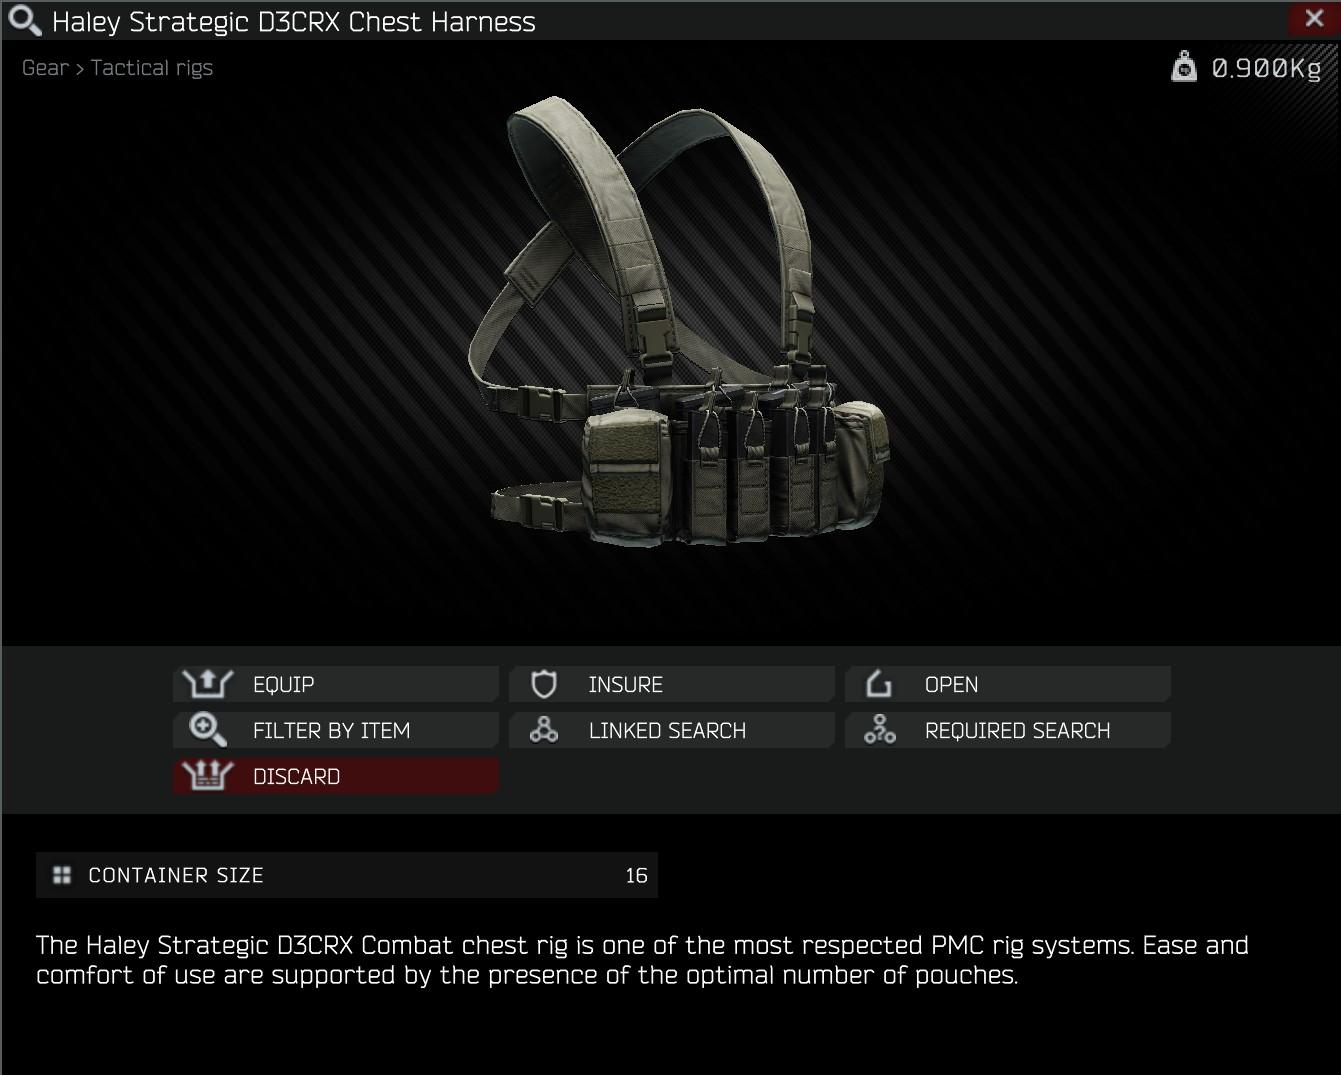 Haley Strategic D3CRX Chest Harness.jpg